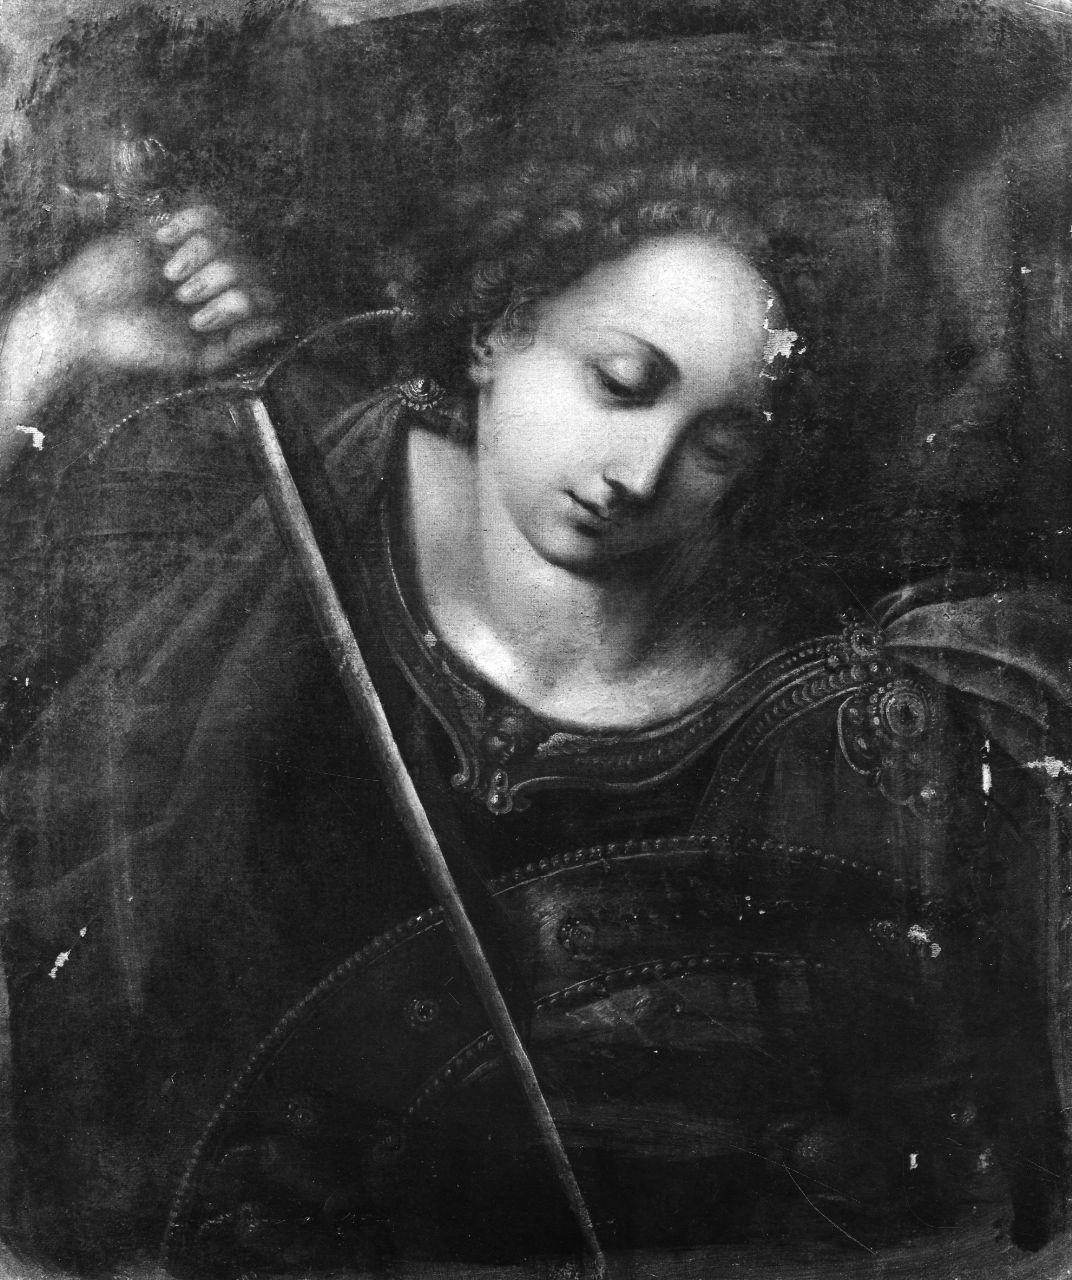 San Michele Arcangelo (dipinto) - ambito fiorentino (inizio sec. XVII)